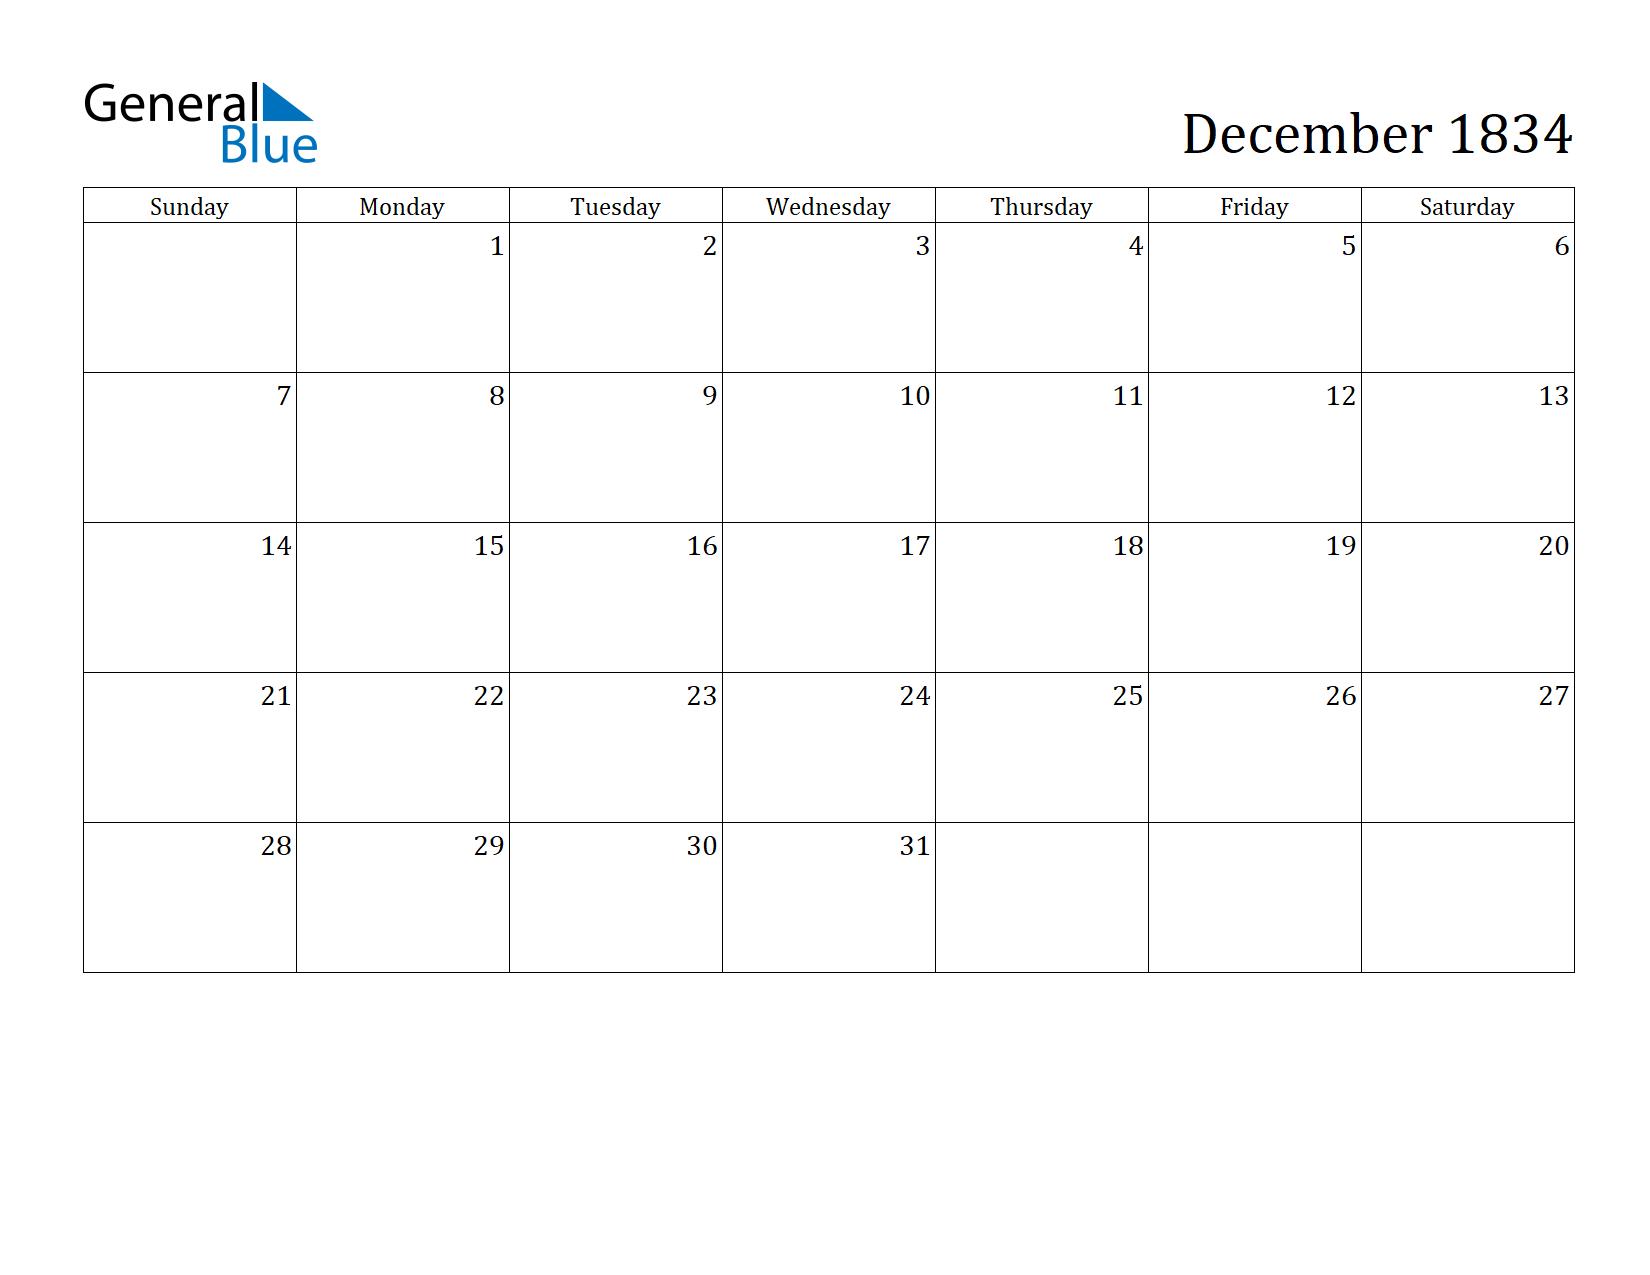 Image of December 1834 Calendar